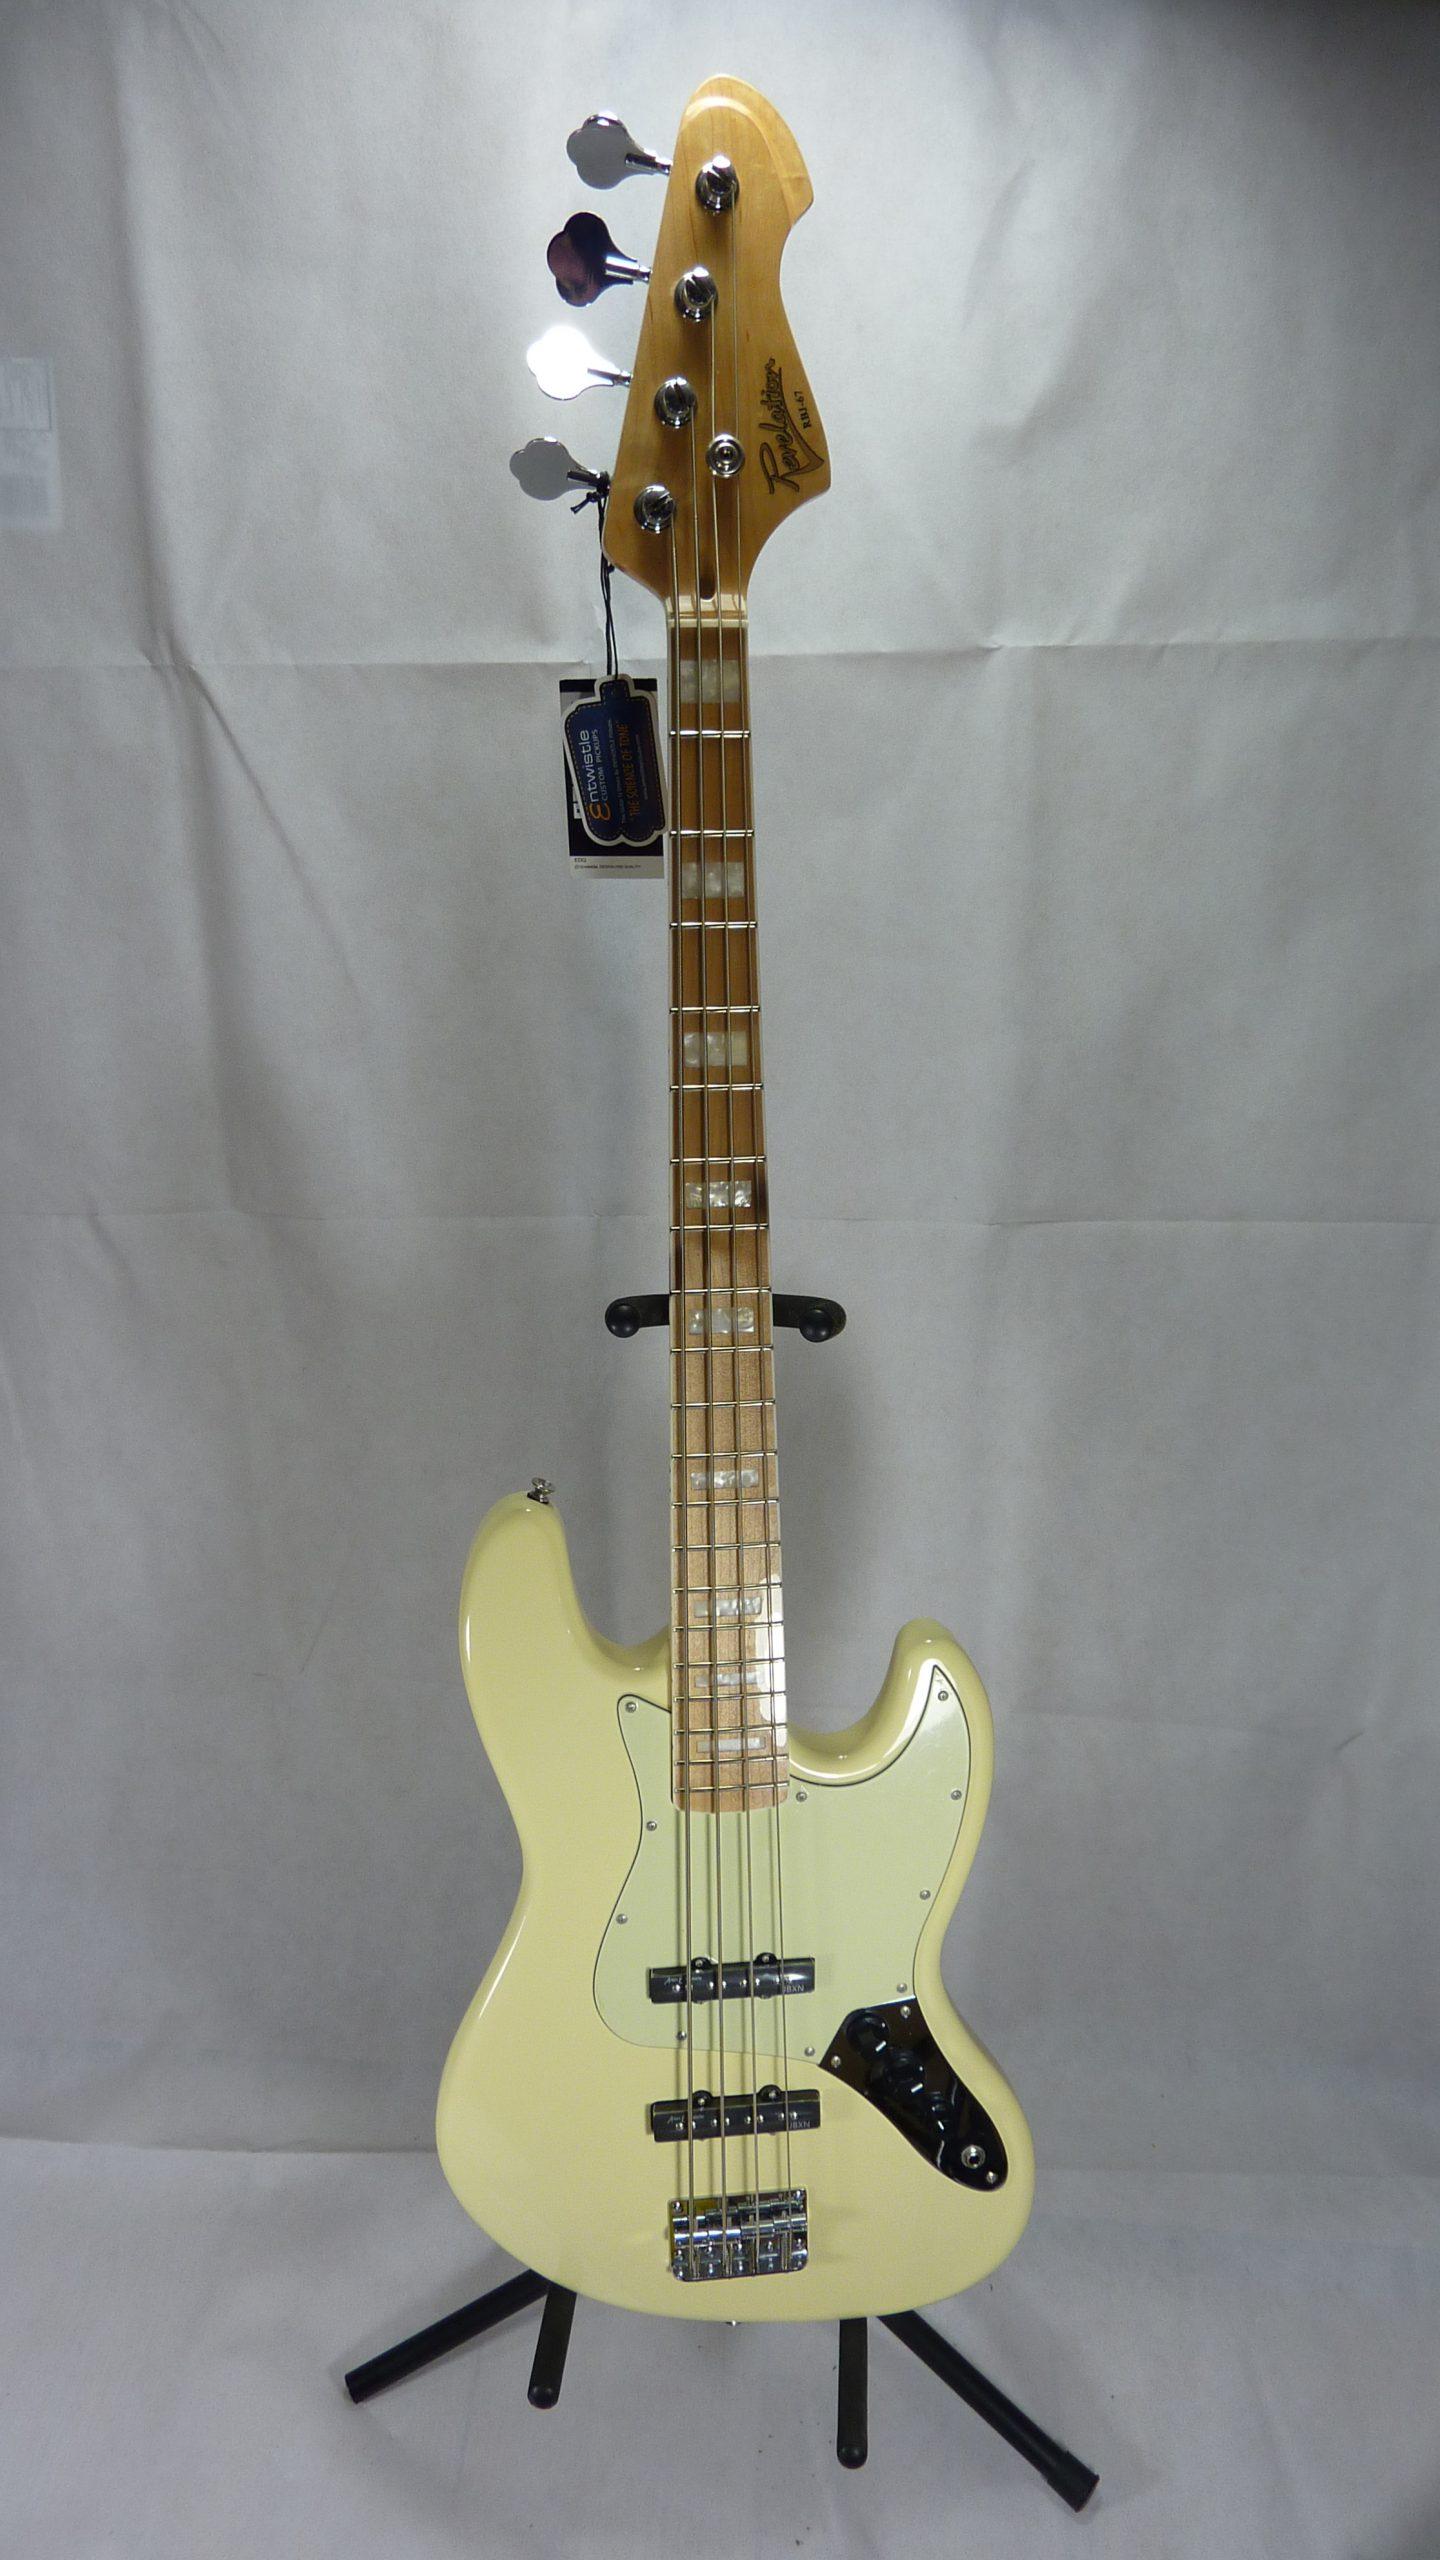 Revelation RBJ67 Bass cream white